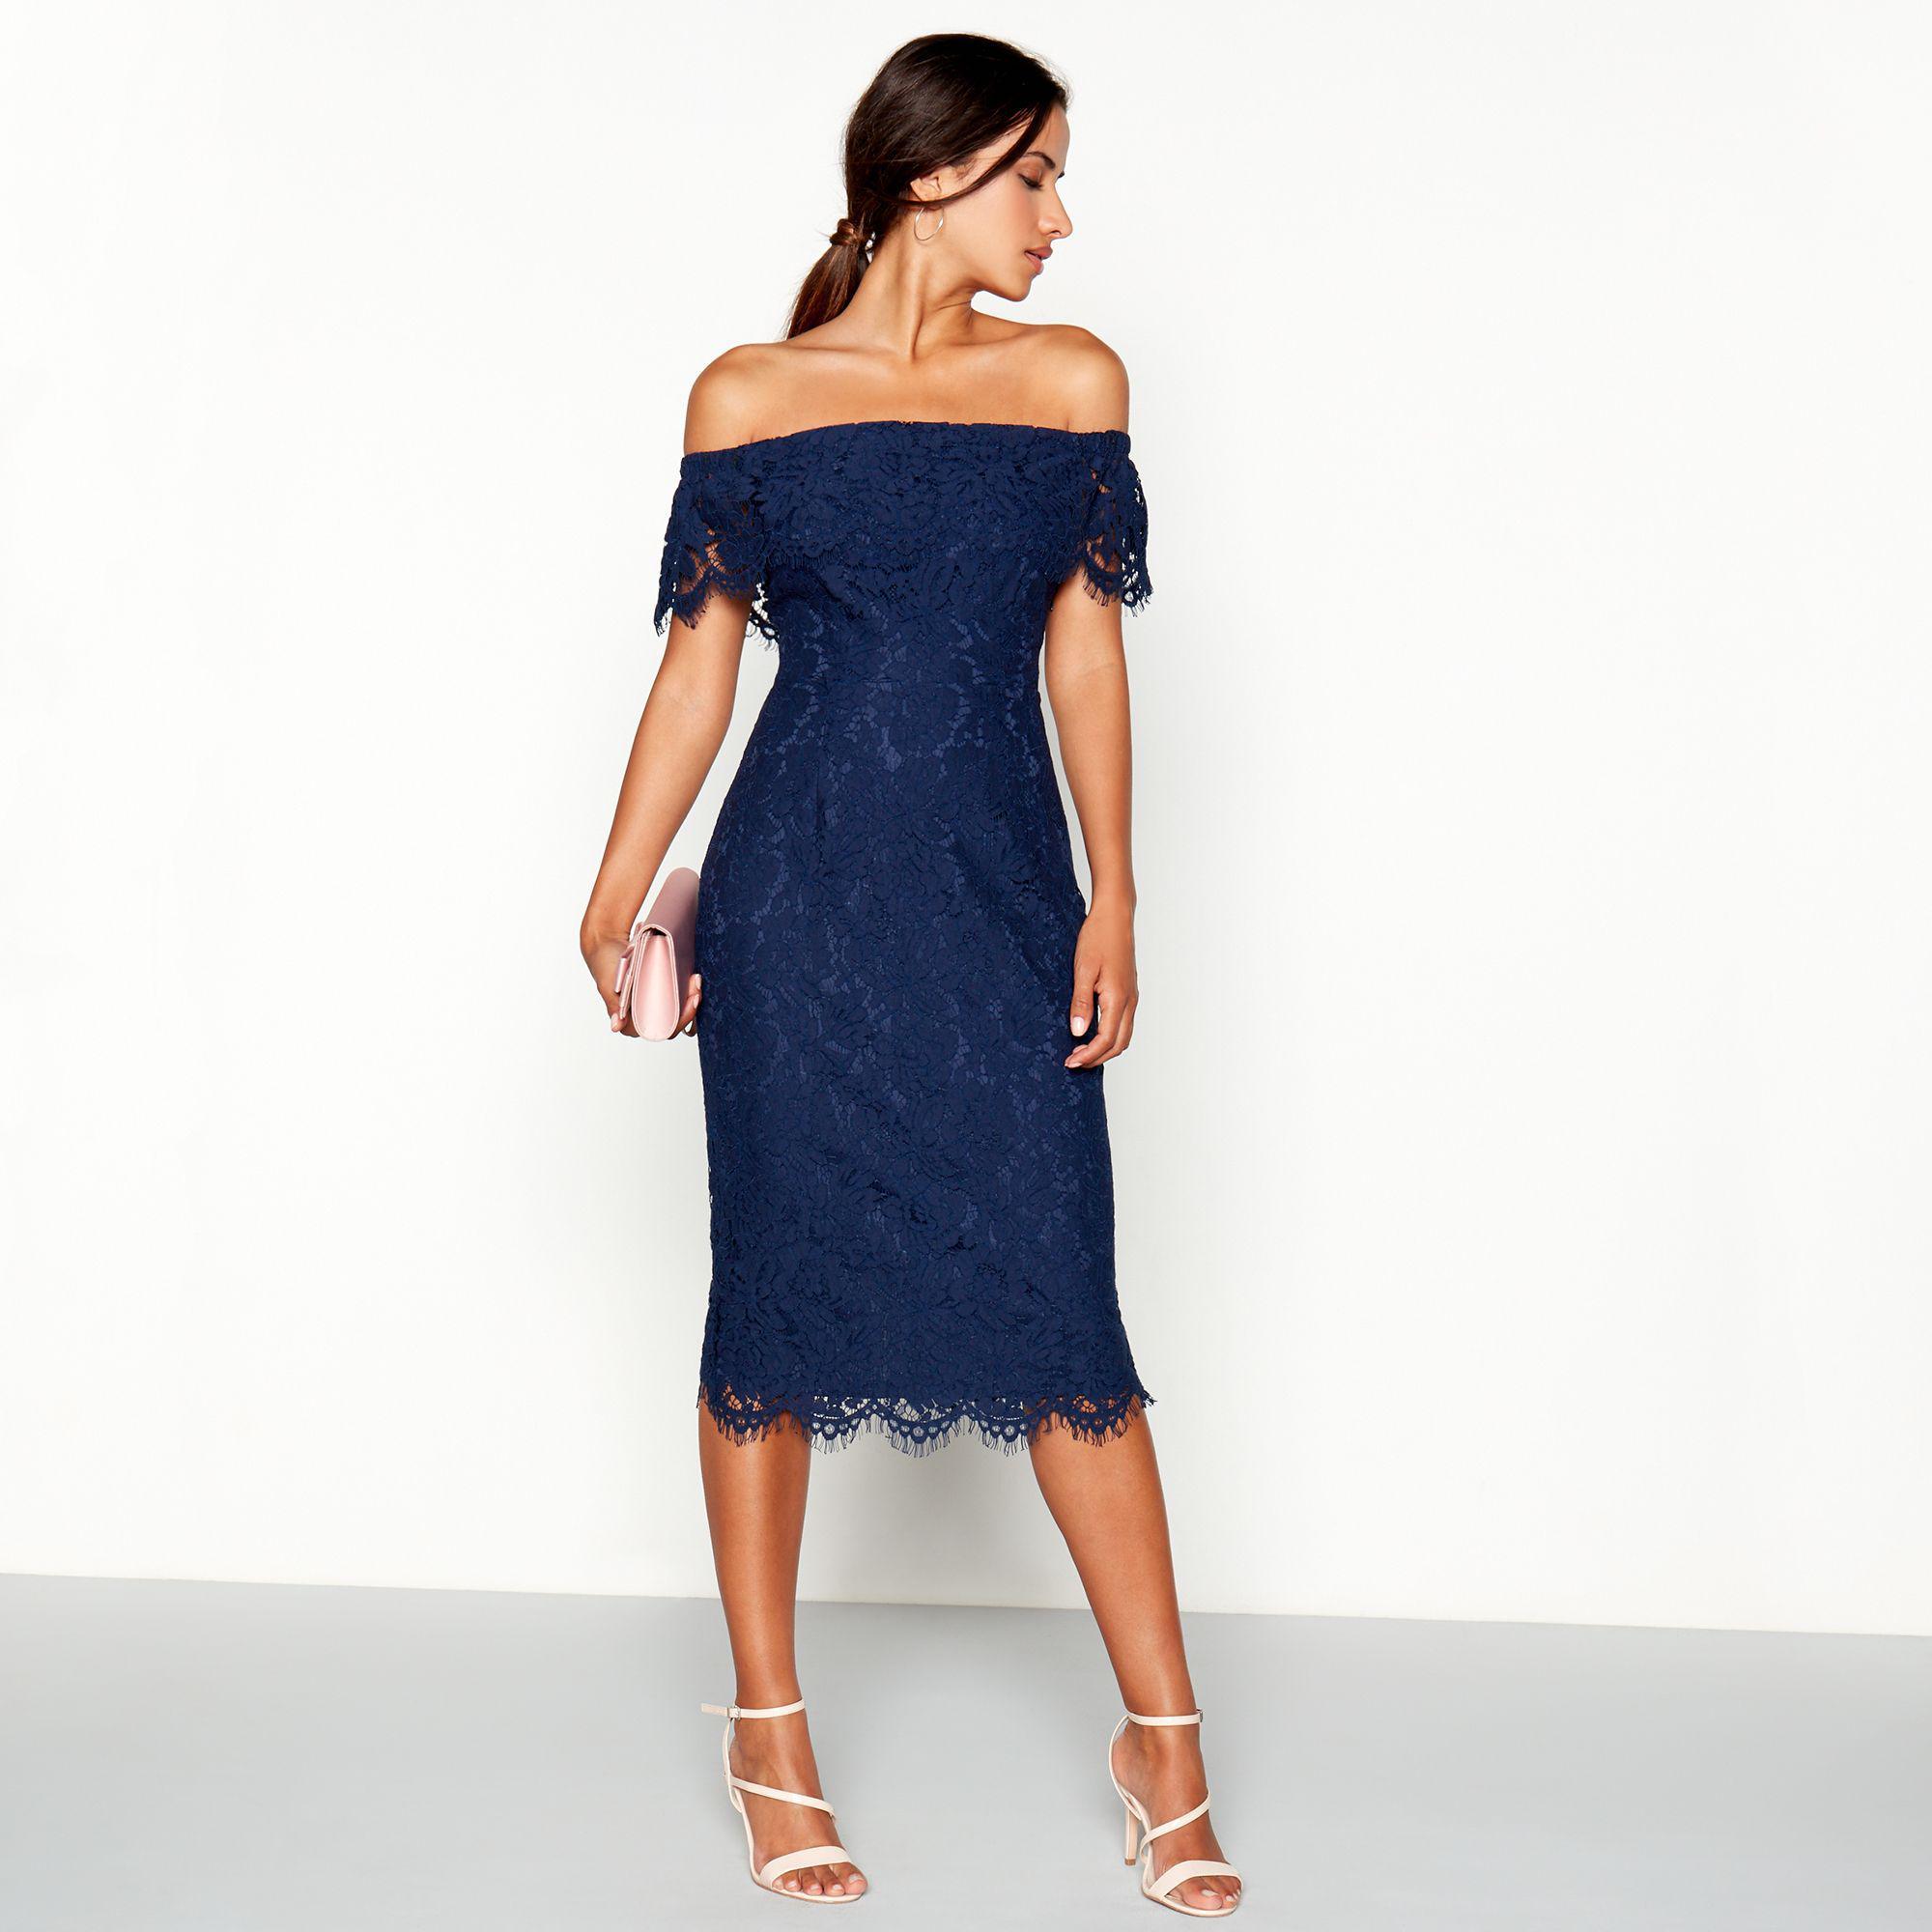 f76957c23f8 Début Navy Lace  briana  Bardot Neck Midi Dress in Blue - Lyst